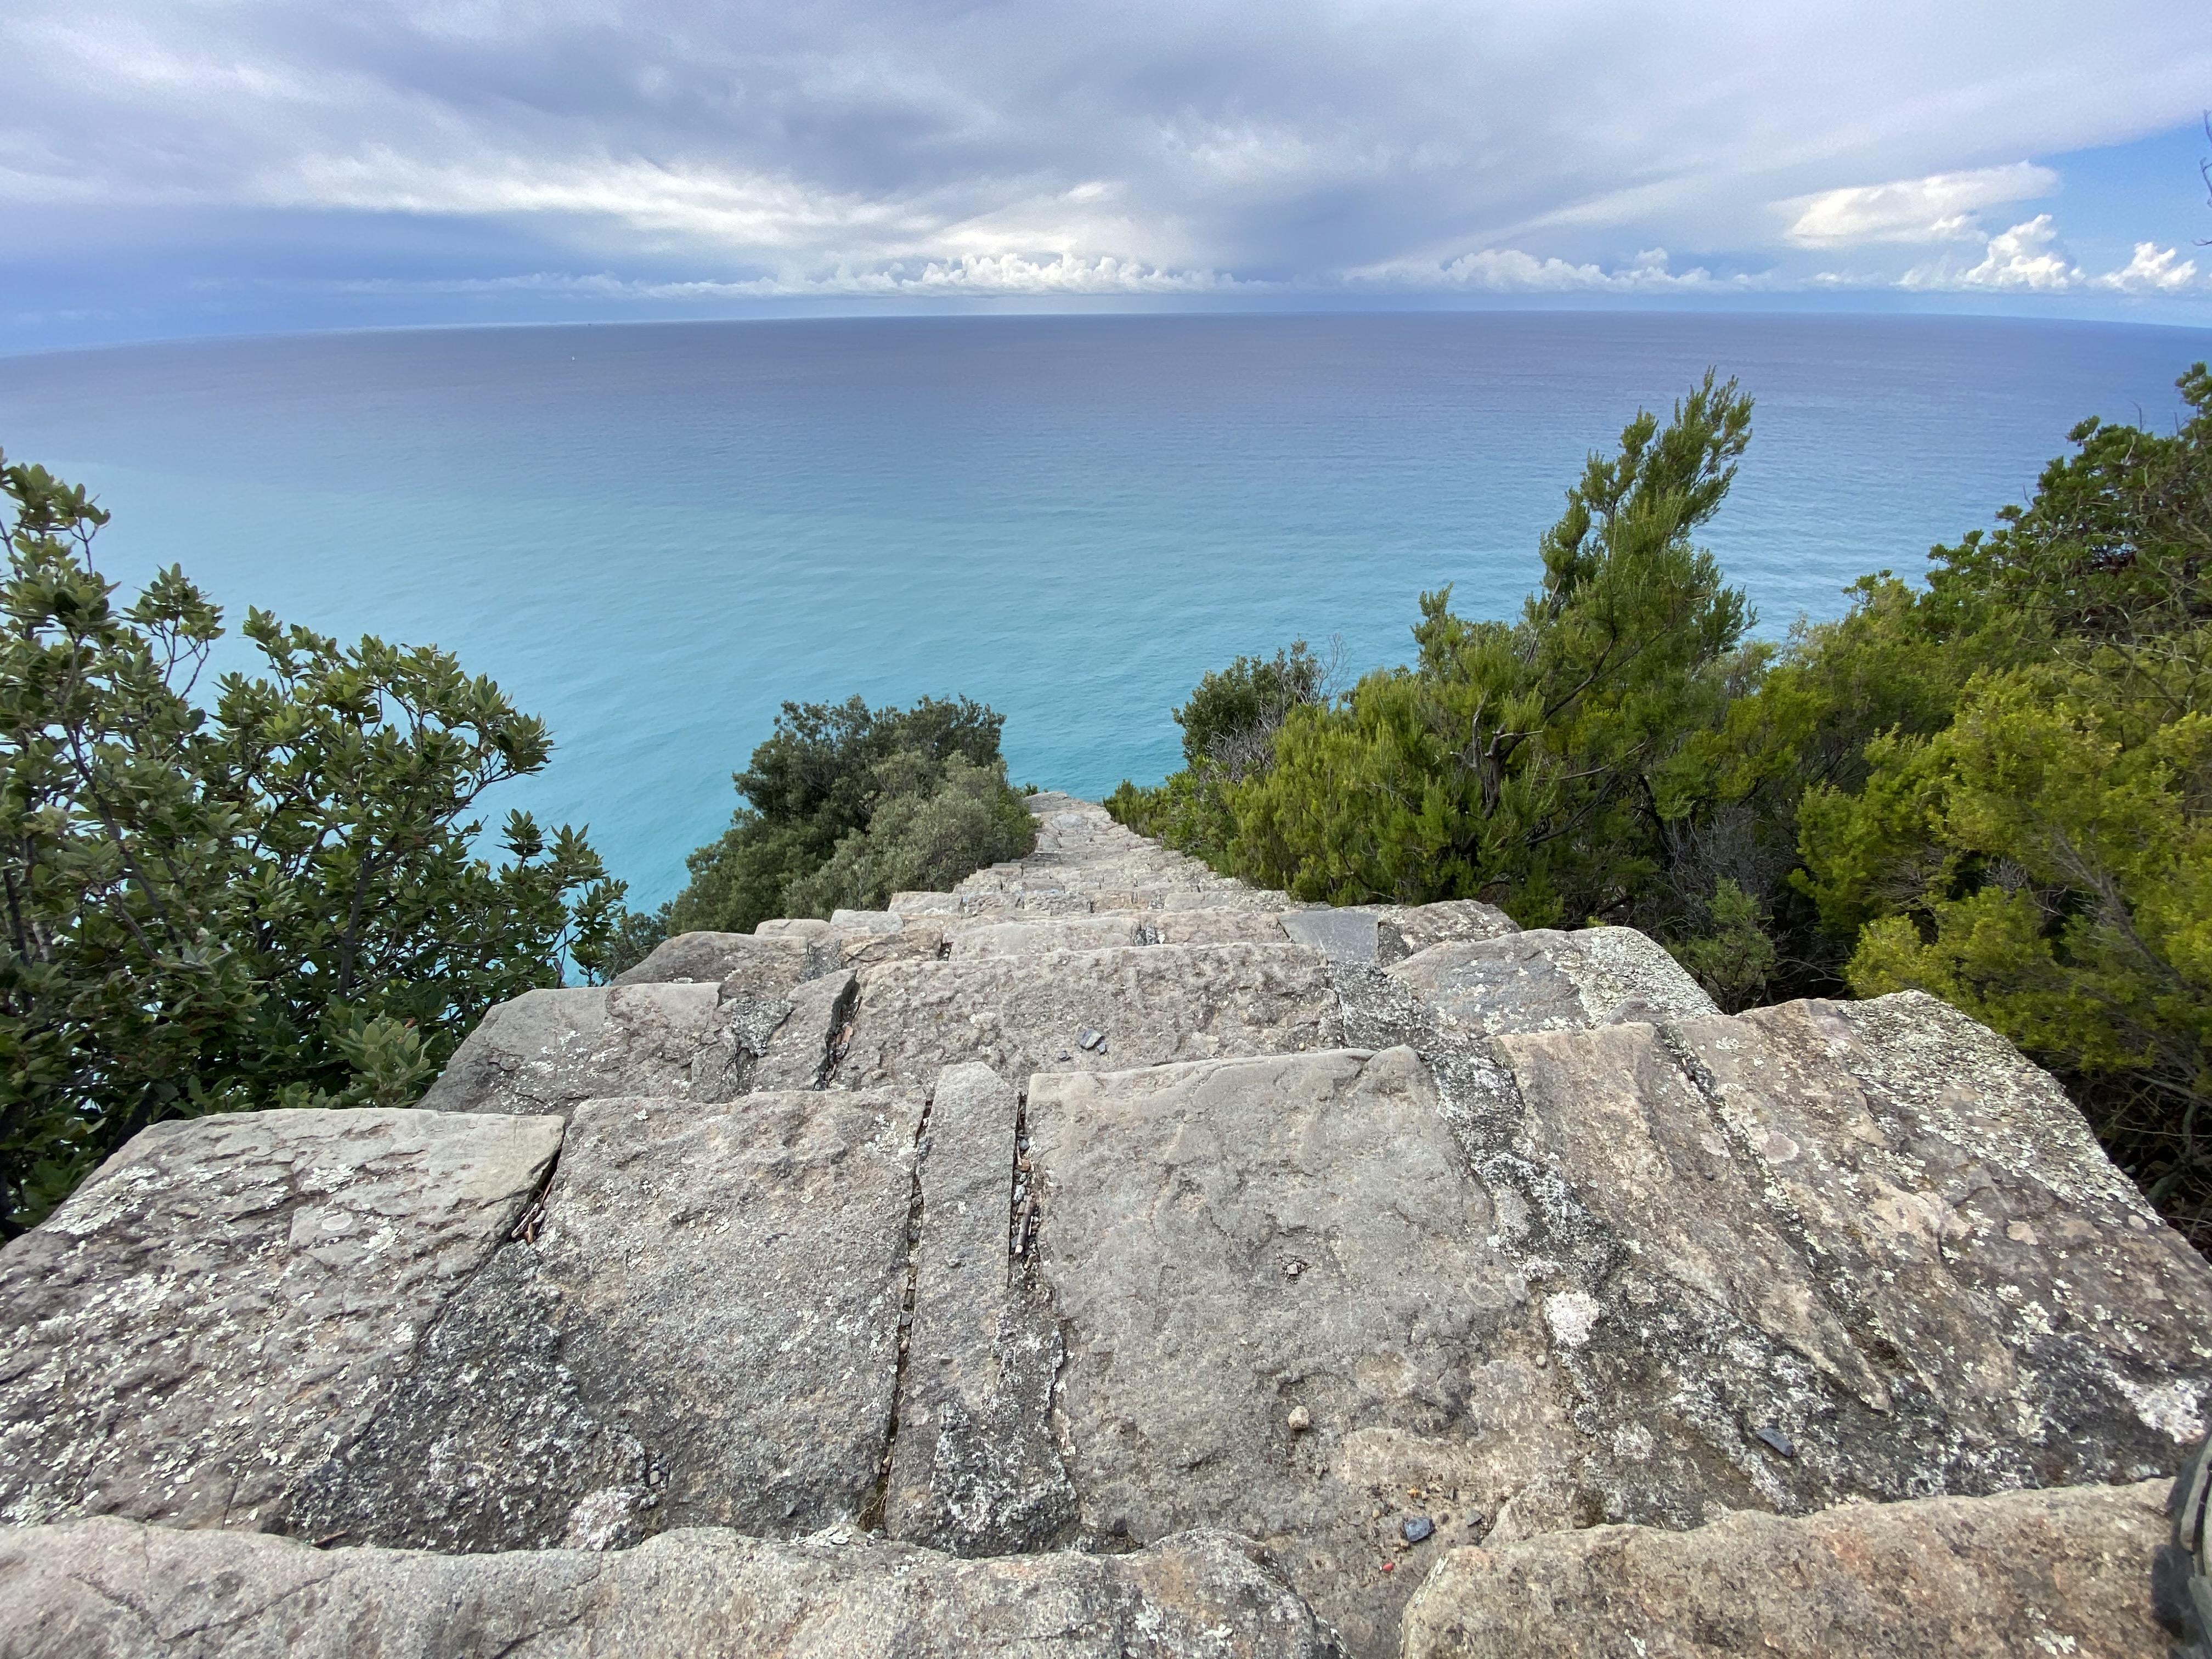 die Grosse Treppe, Monesteroli, Ligurien